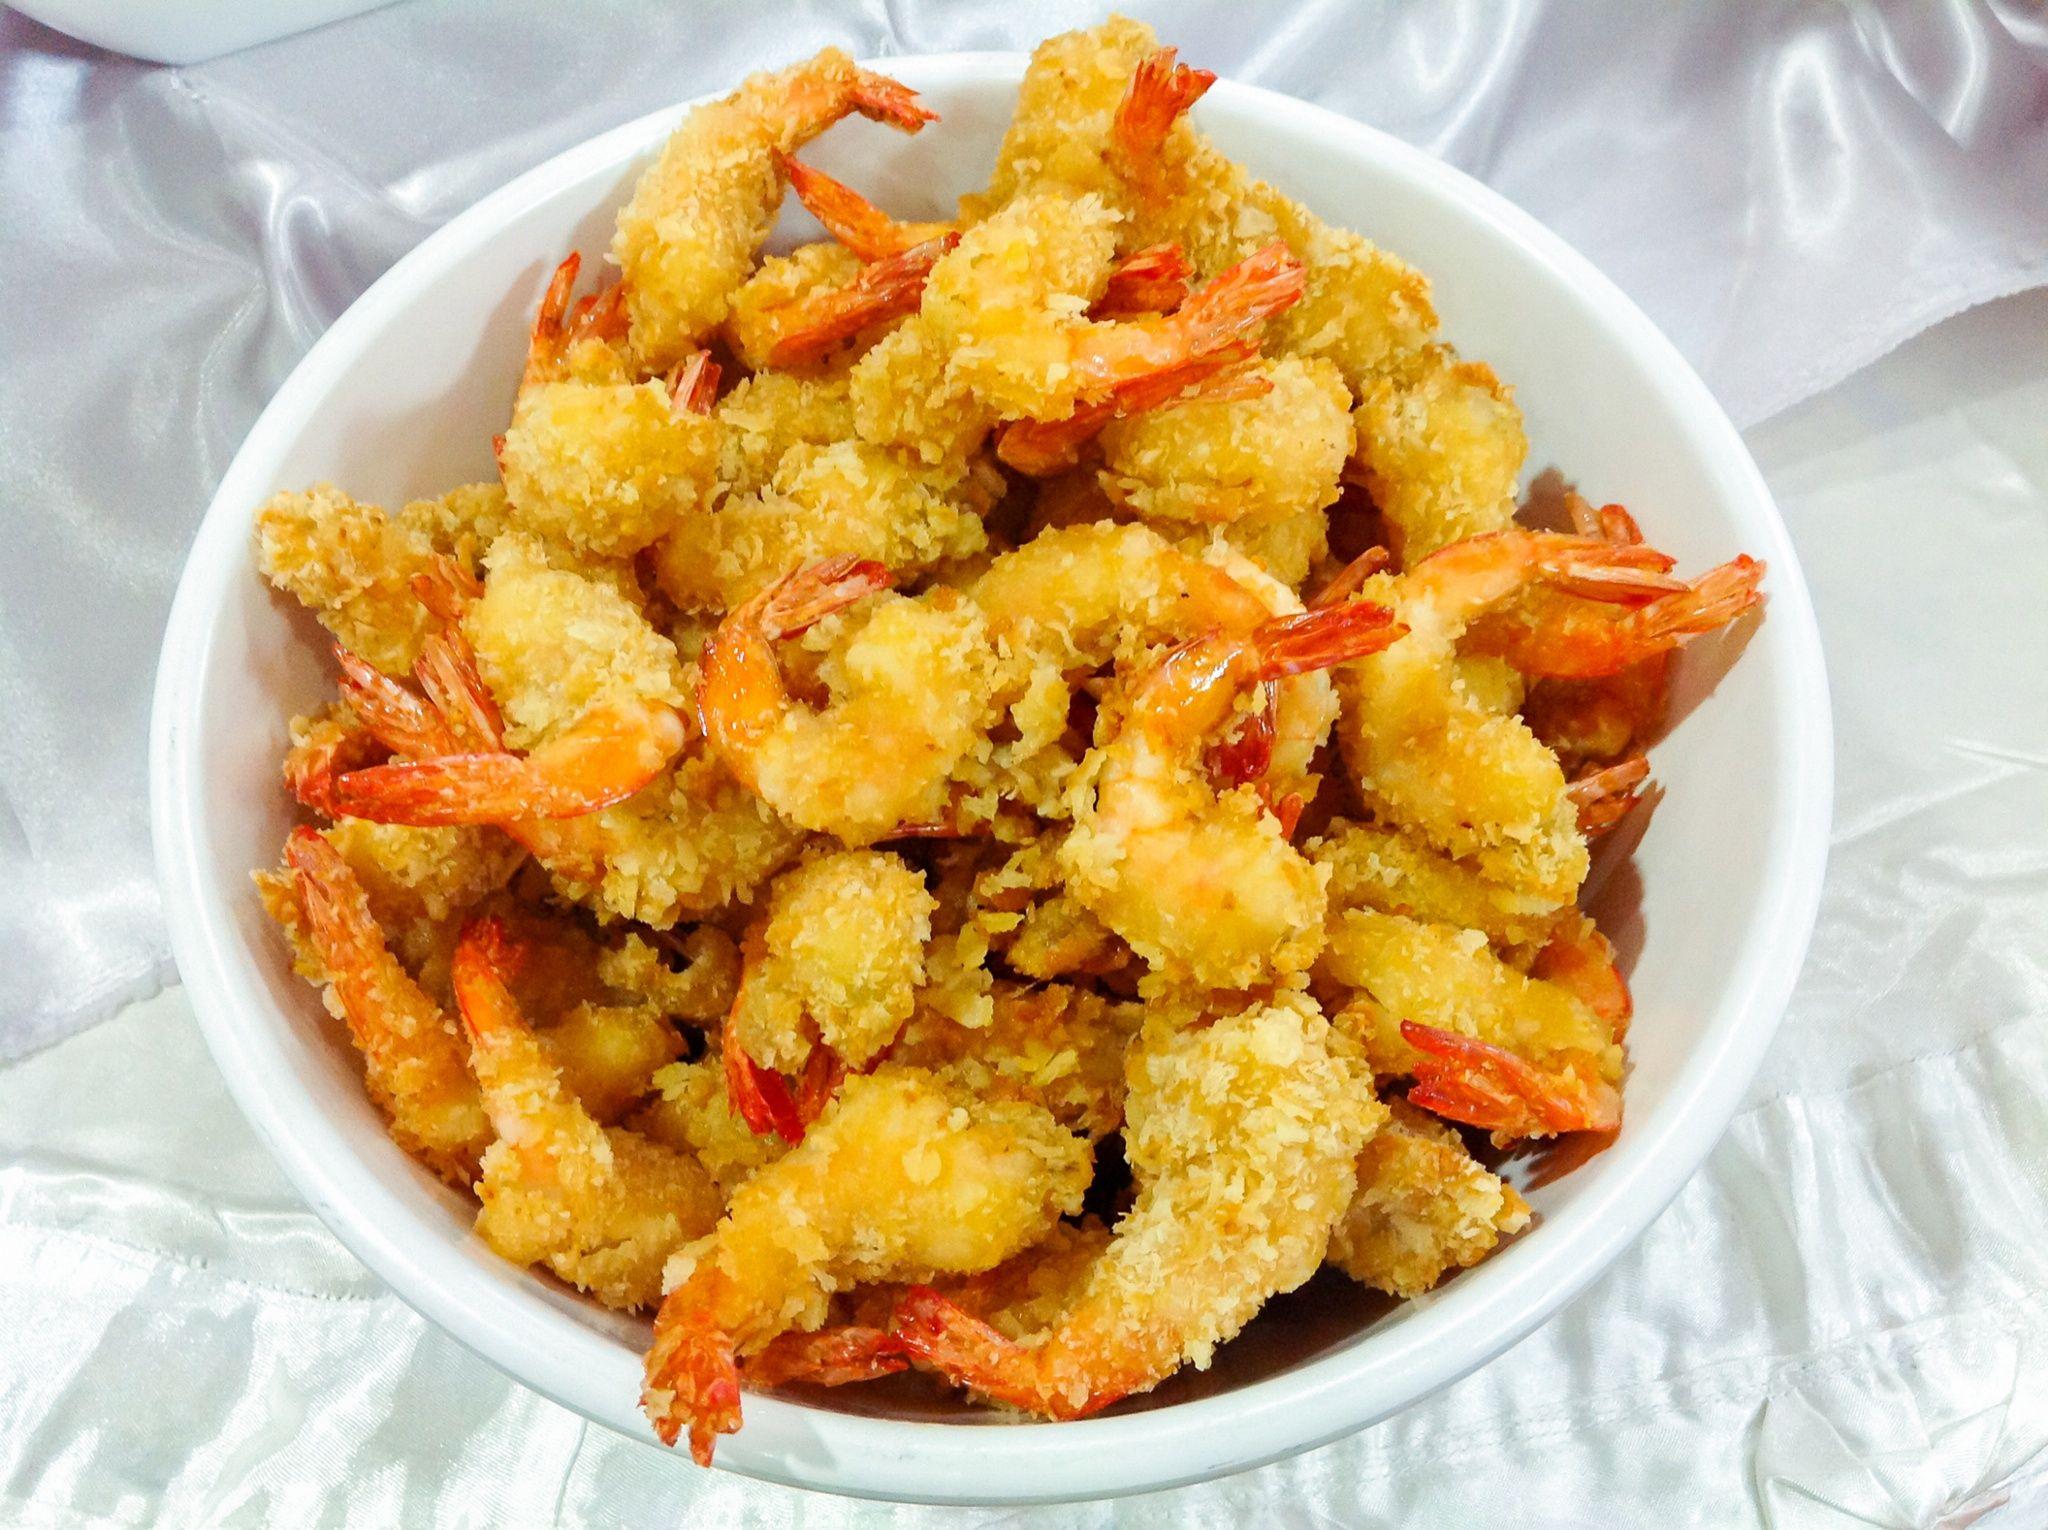 Tempura - Deep Fried shrimp by Maposee Soleh on 500px